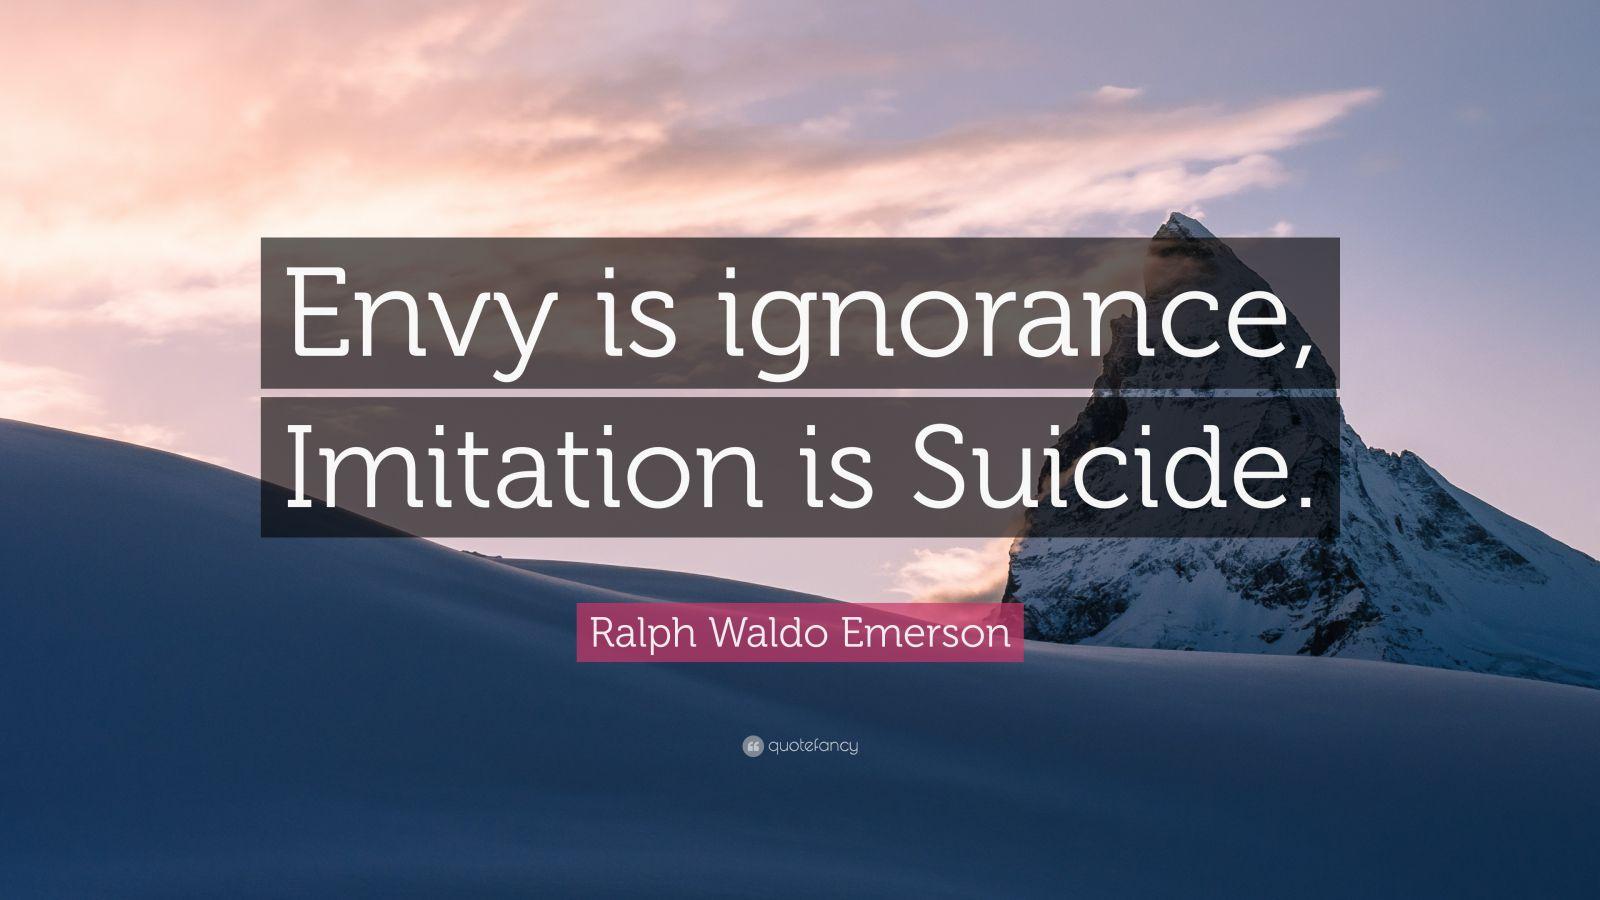 ralph waldo emerson heroism essay